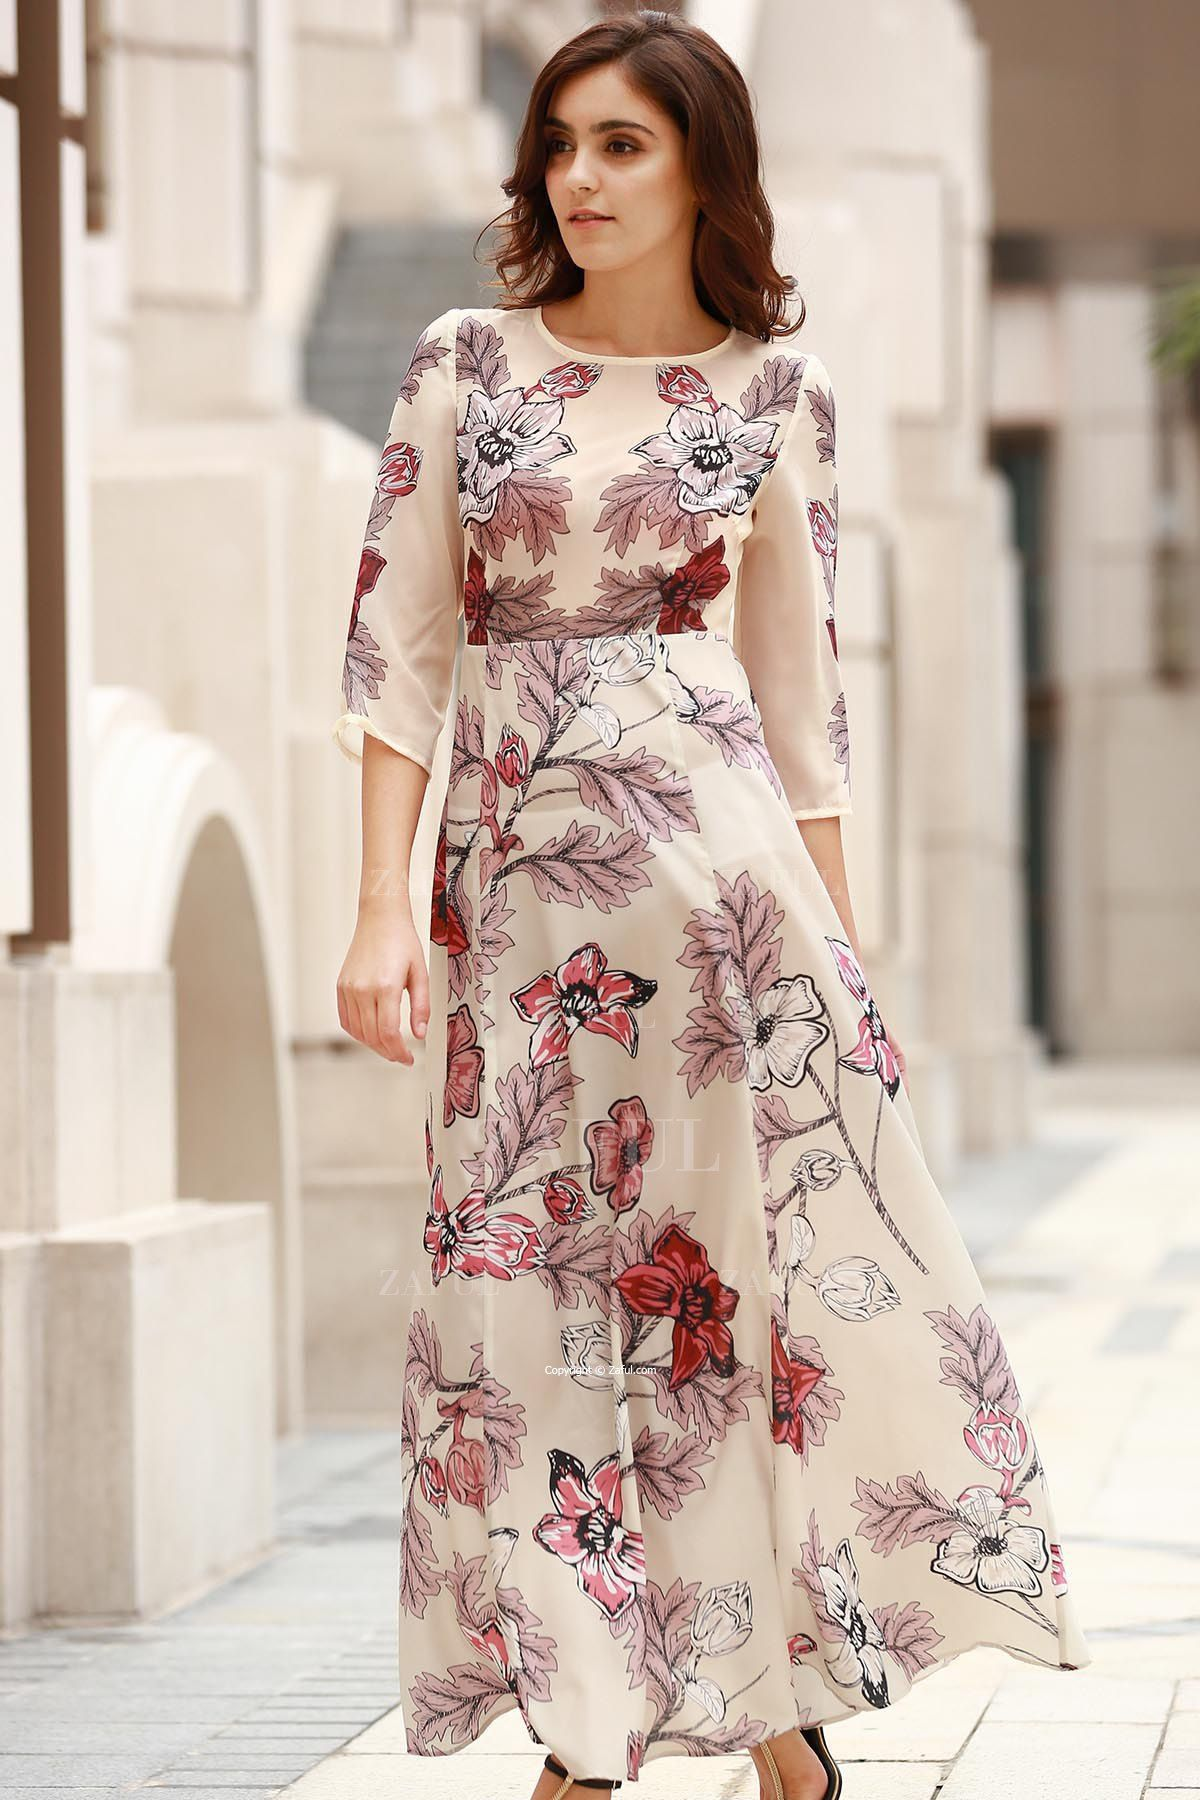 3 4 Sleeve Floral Print Long Dress Off White Long Dress Floral Print Dress Long Printed Long Dresses [ 1800 x 1200 Pixel ]